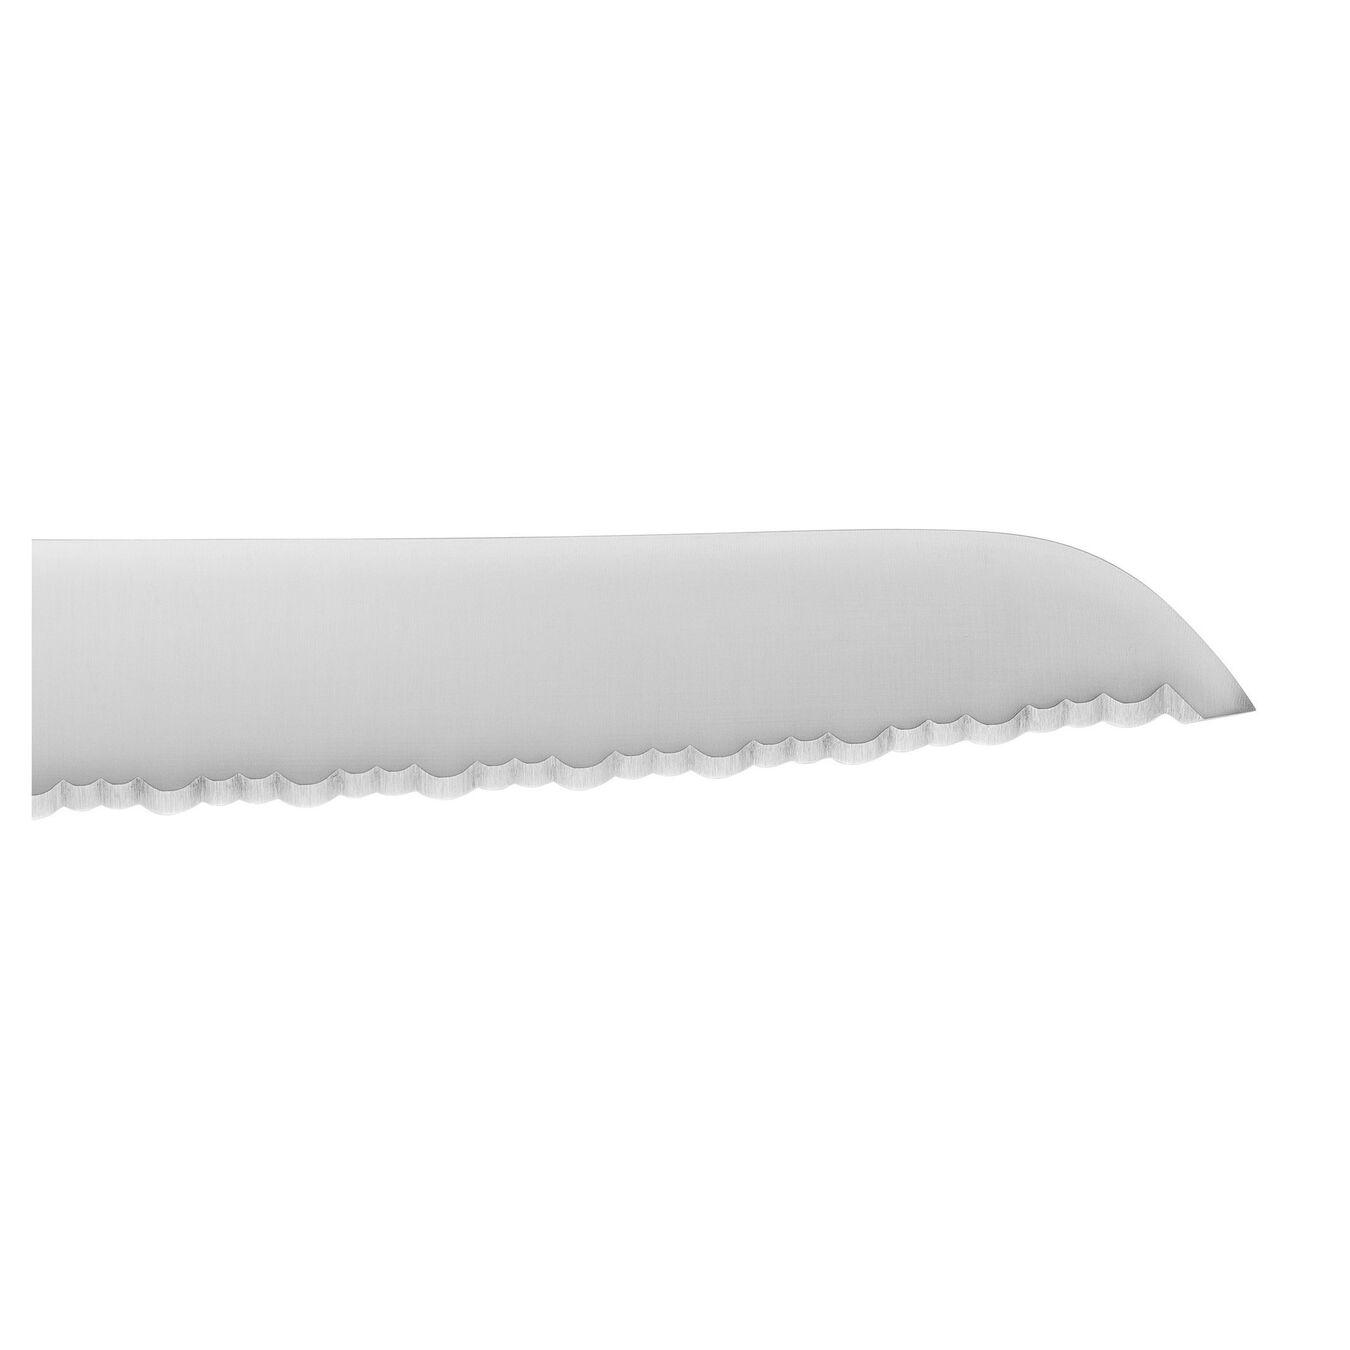 Brotmesser 26 cm, Schwarz, Kunststoff,,large 2